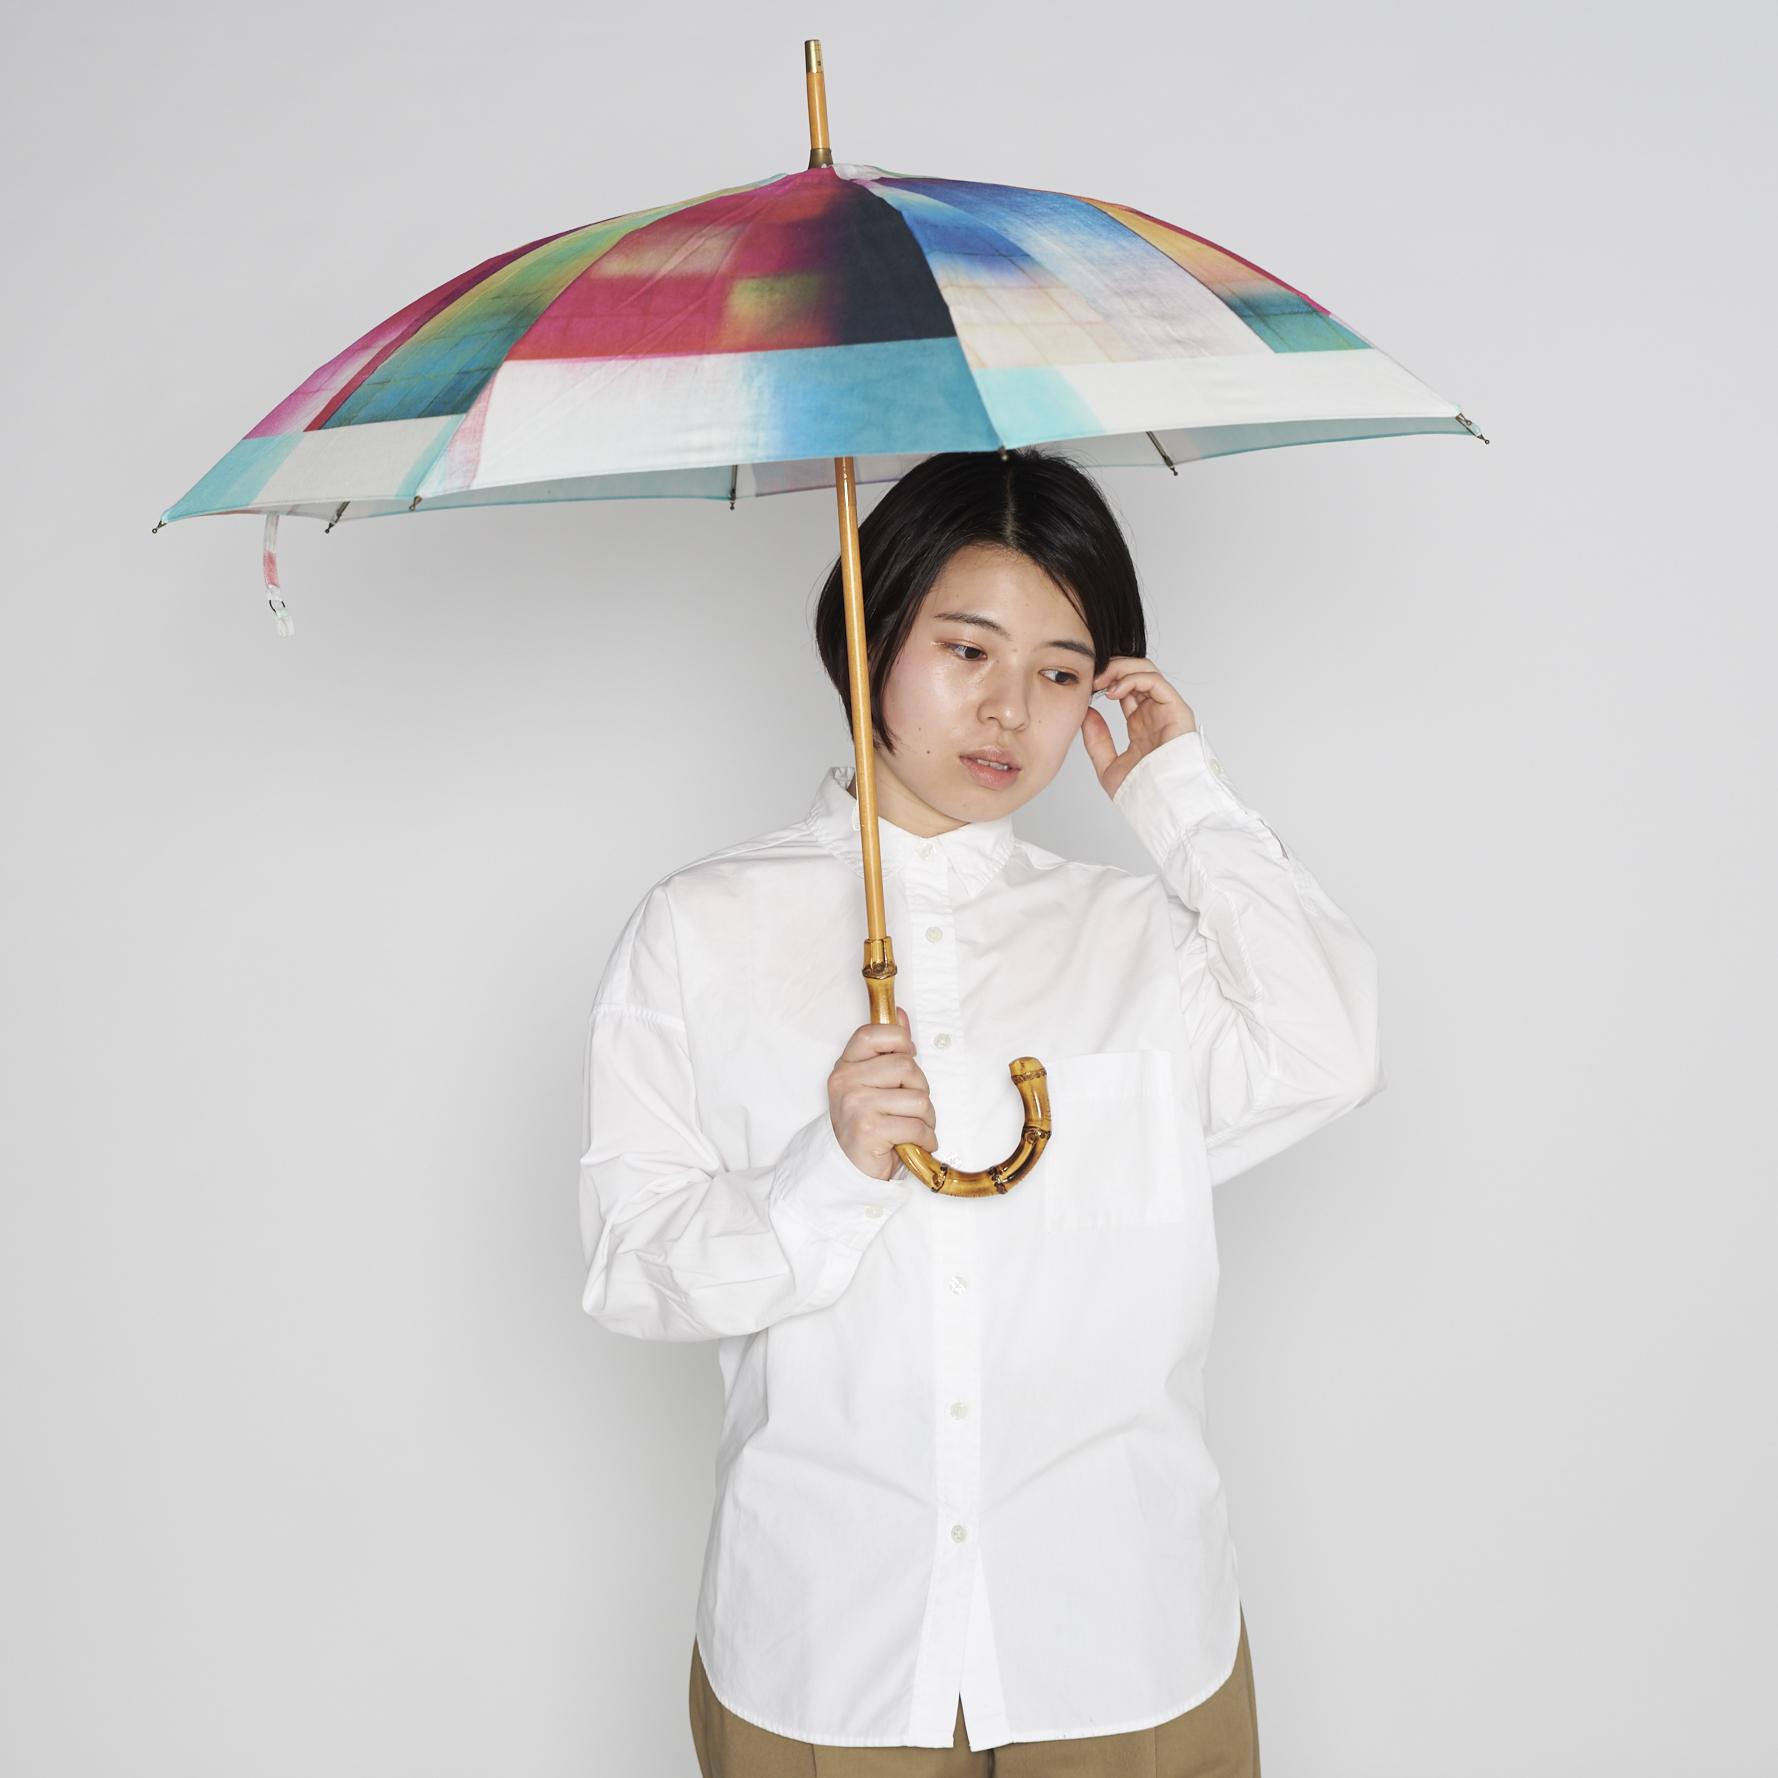 晴雨兼用日傘・長傘 - STONE BLOCK - 1color